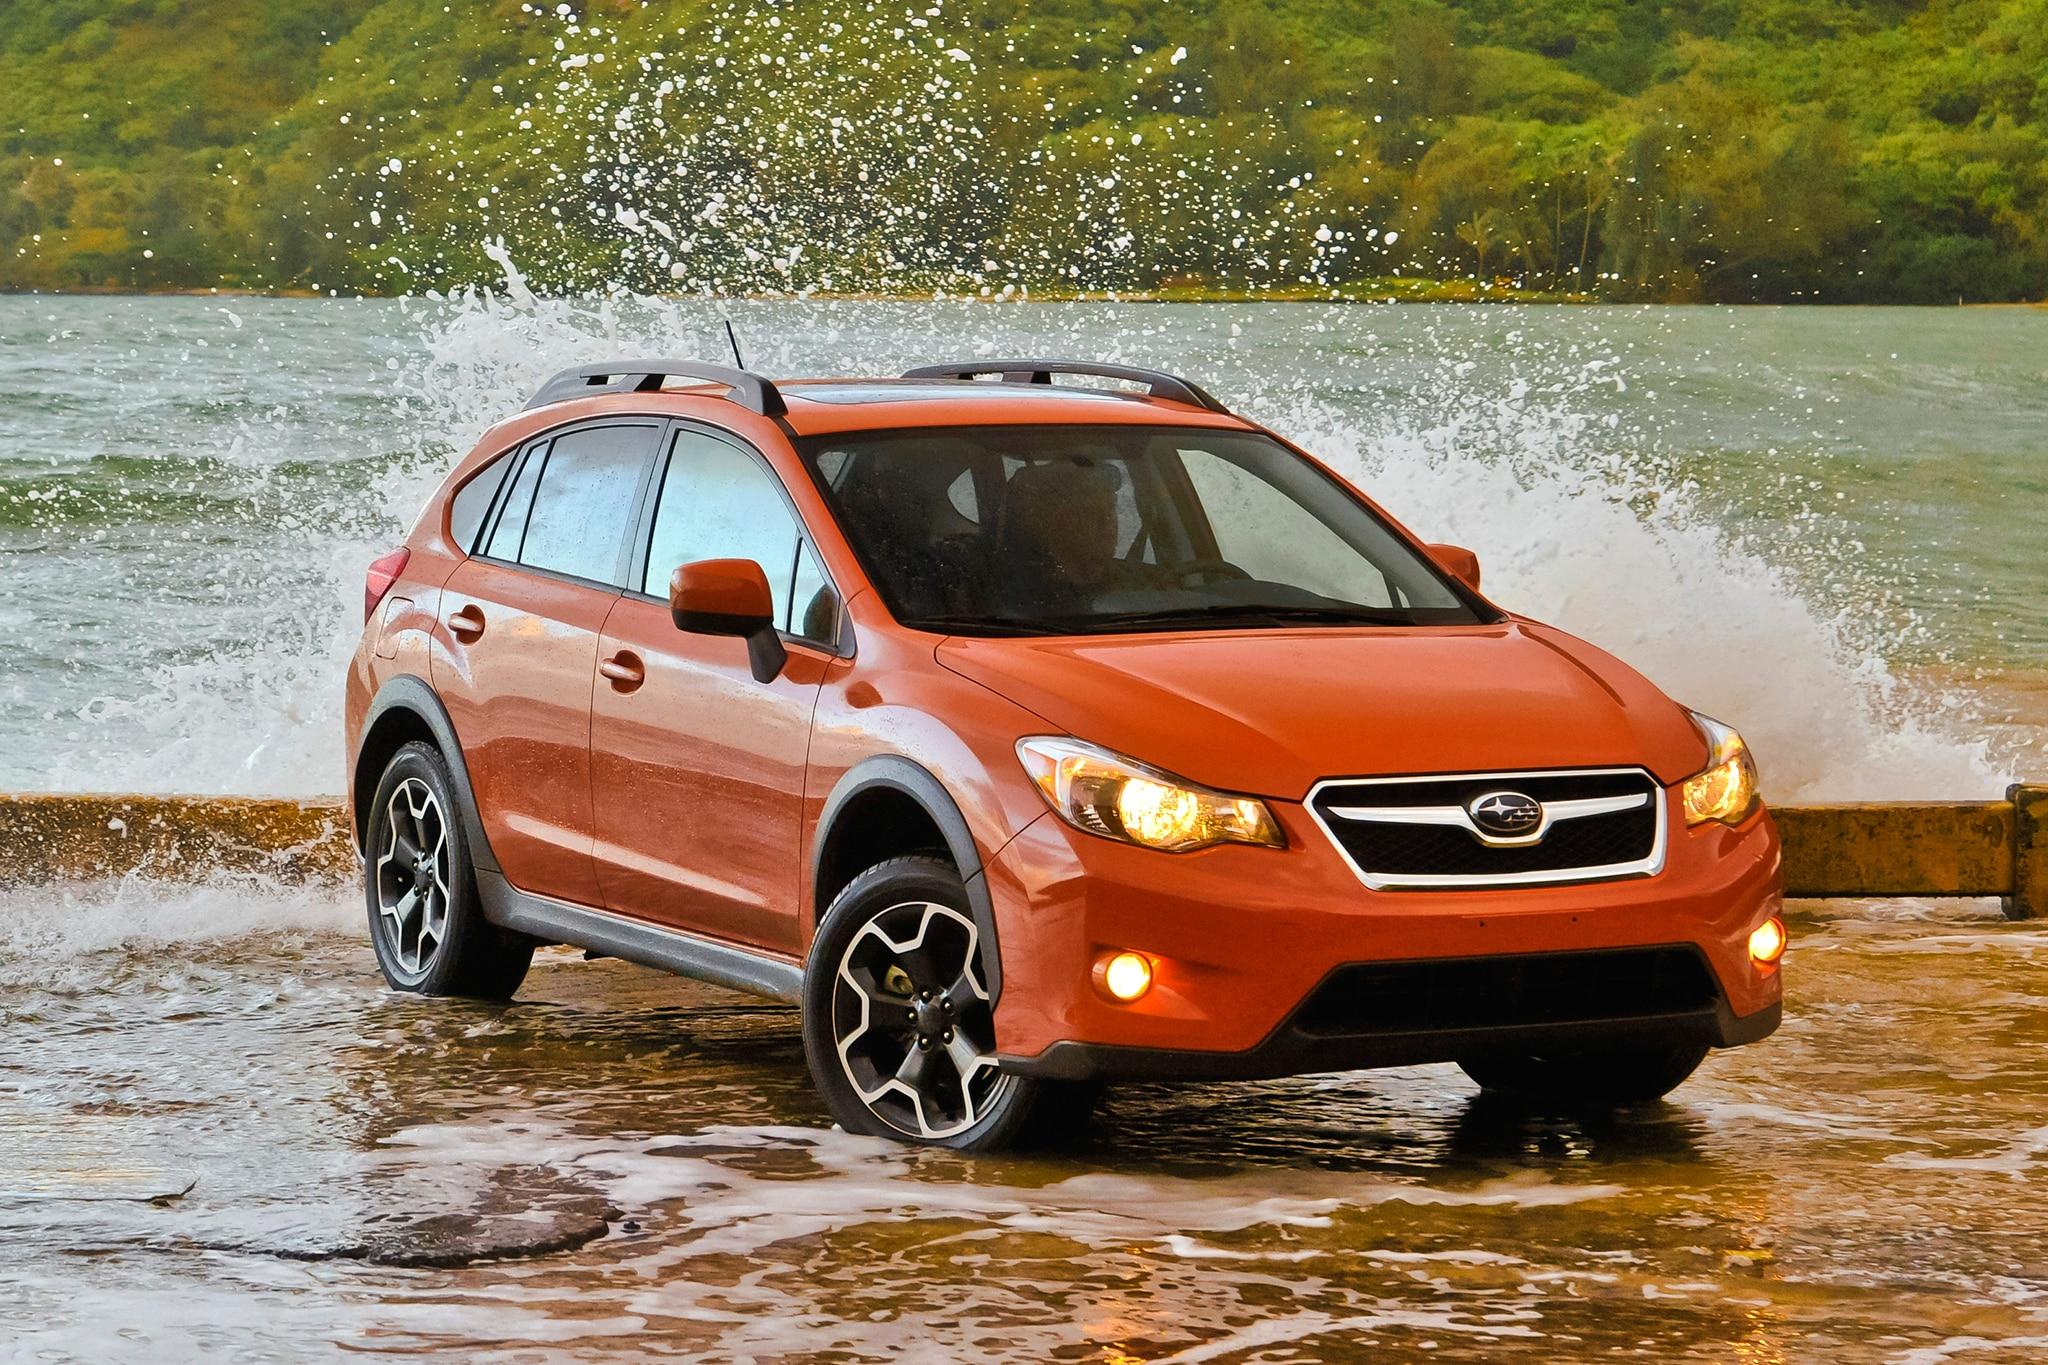 2013 Subaru XV Crosstrek Water View1